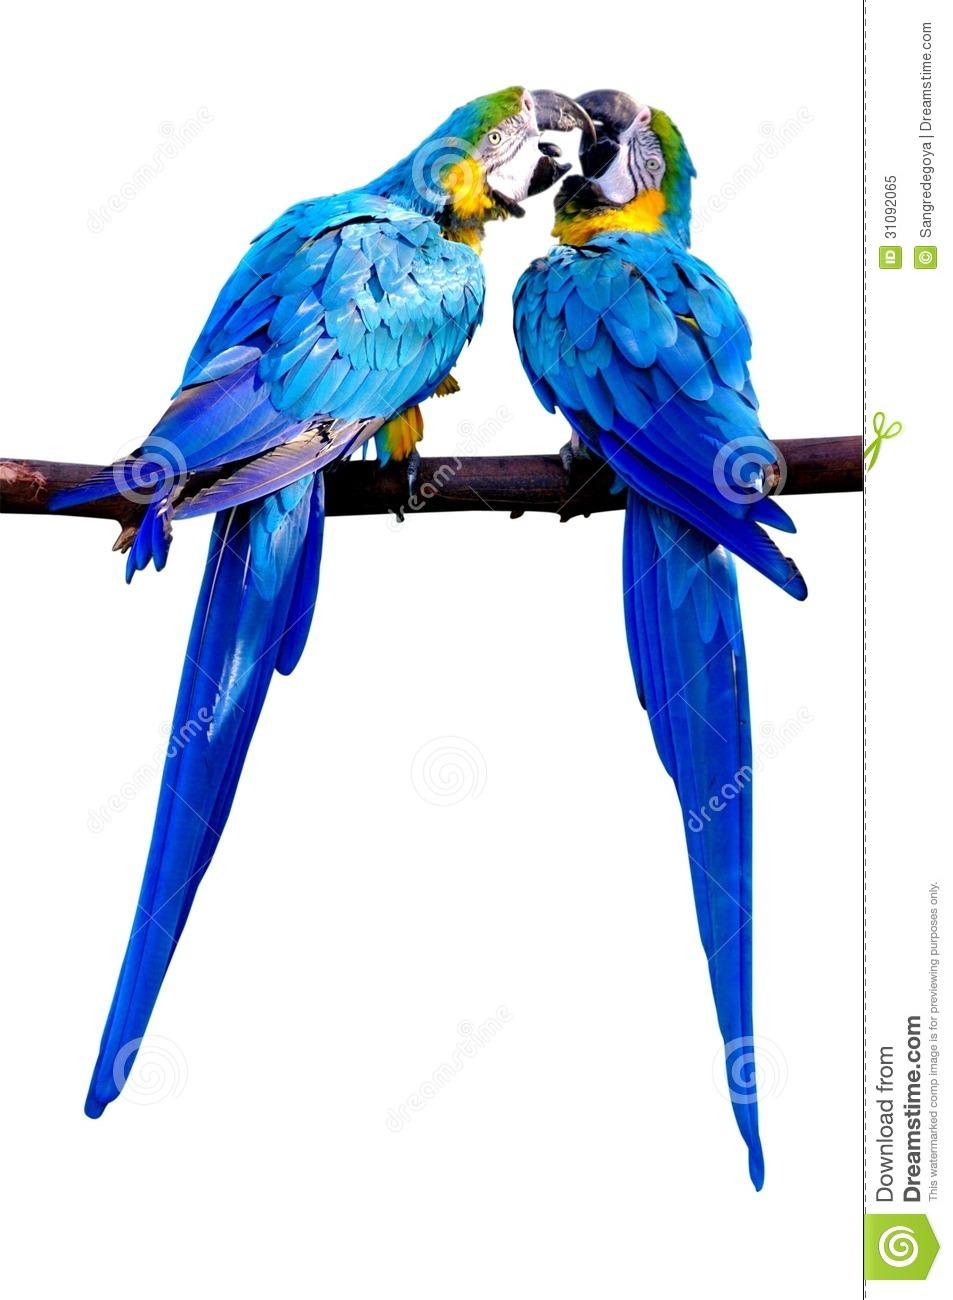 Kissing Parrots Royalty Free Stock Photo.